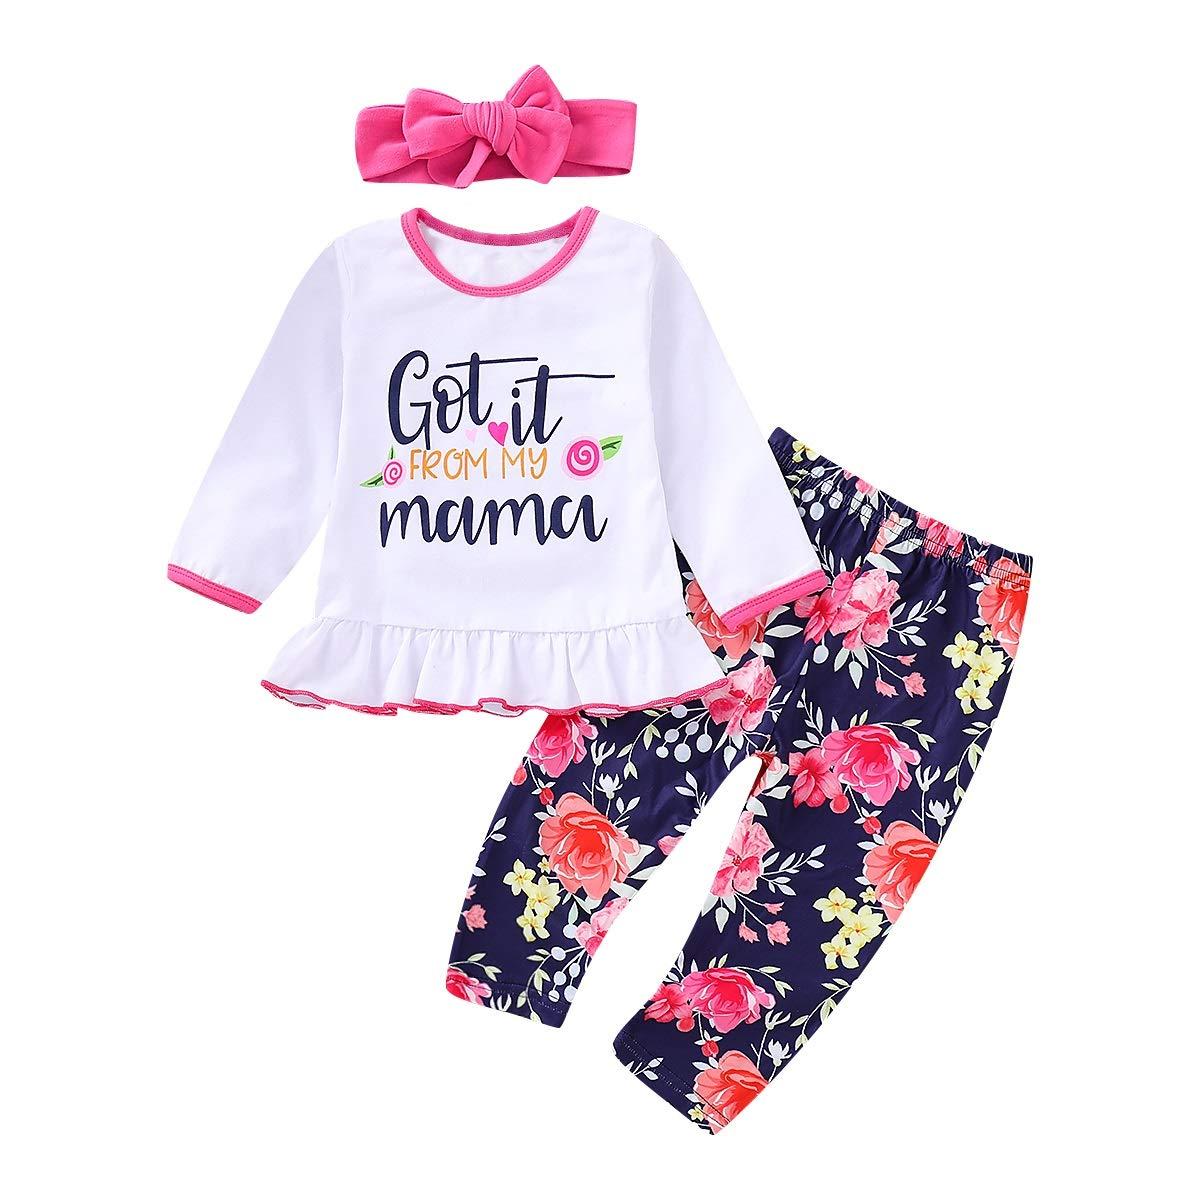 1-5T Little Girl Casual Letters Top Shirt Floral Leggings Headband Set